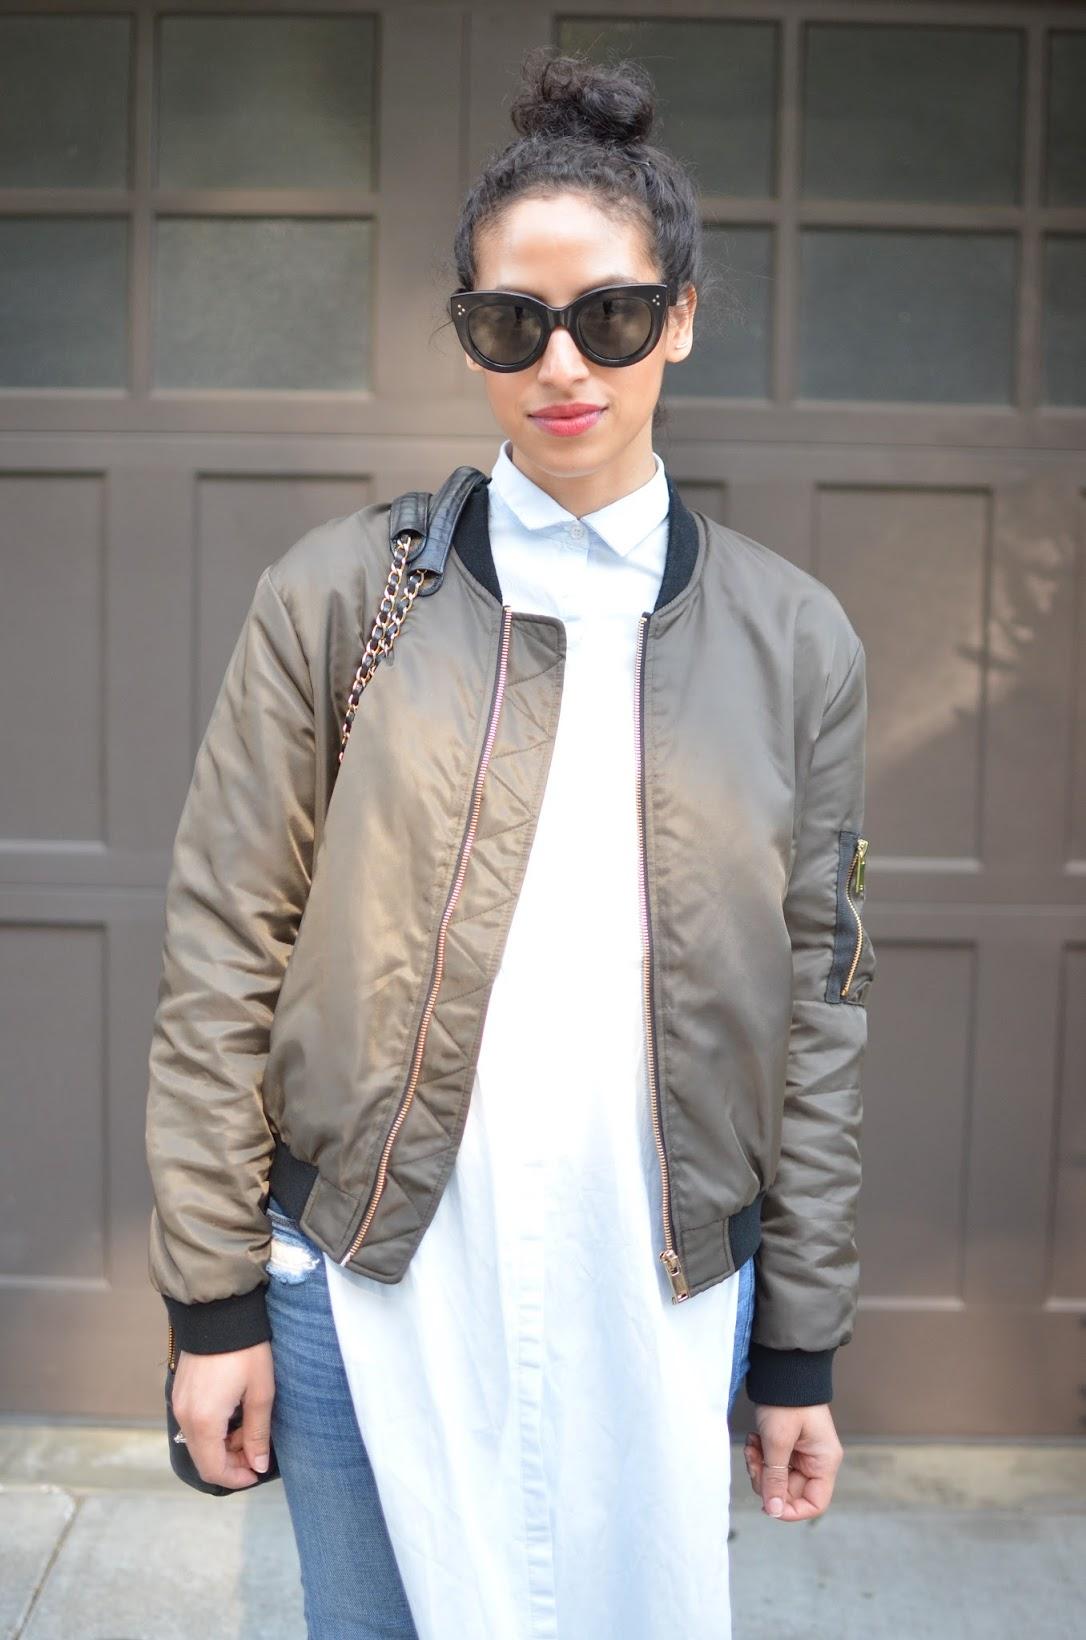 Zara olive bomber jacket, olive bomber jacket, bomber jacket, zara bomber jacket, spring style, chic spring style, Street style, Zara, Celine audrey sunglasses